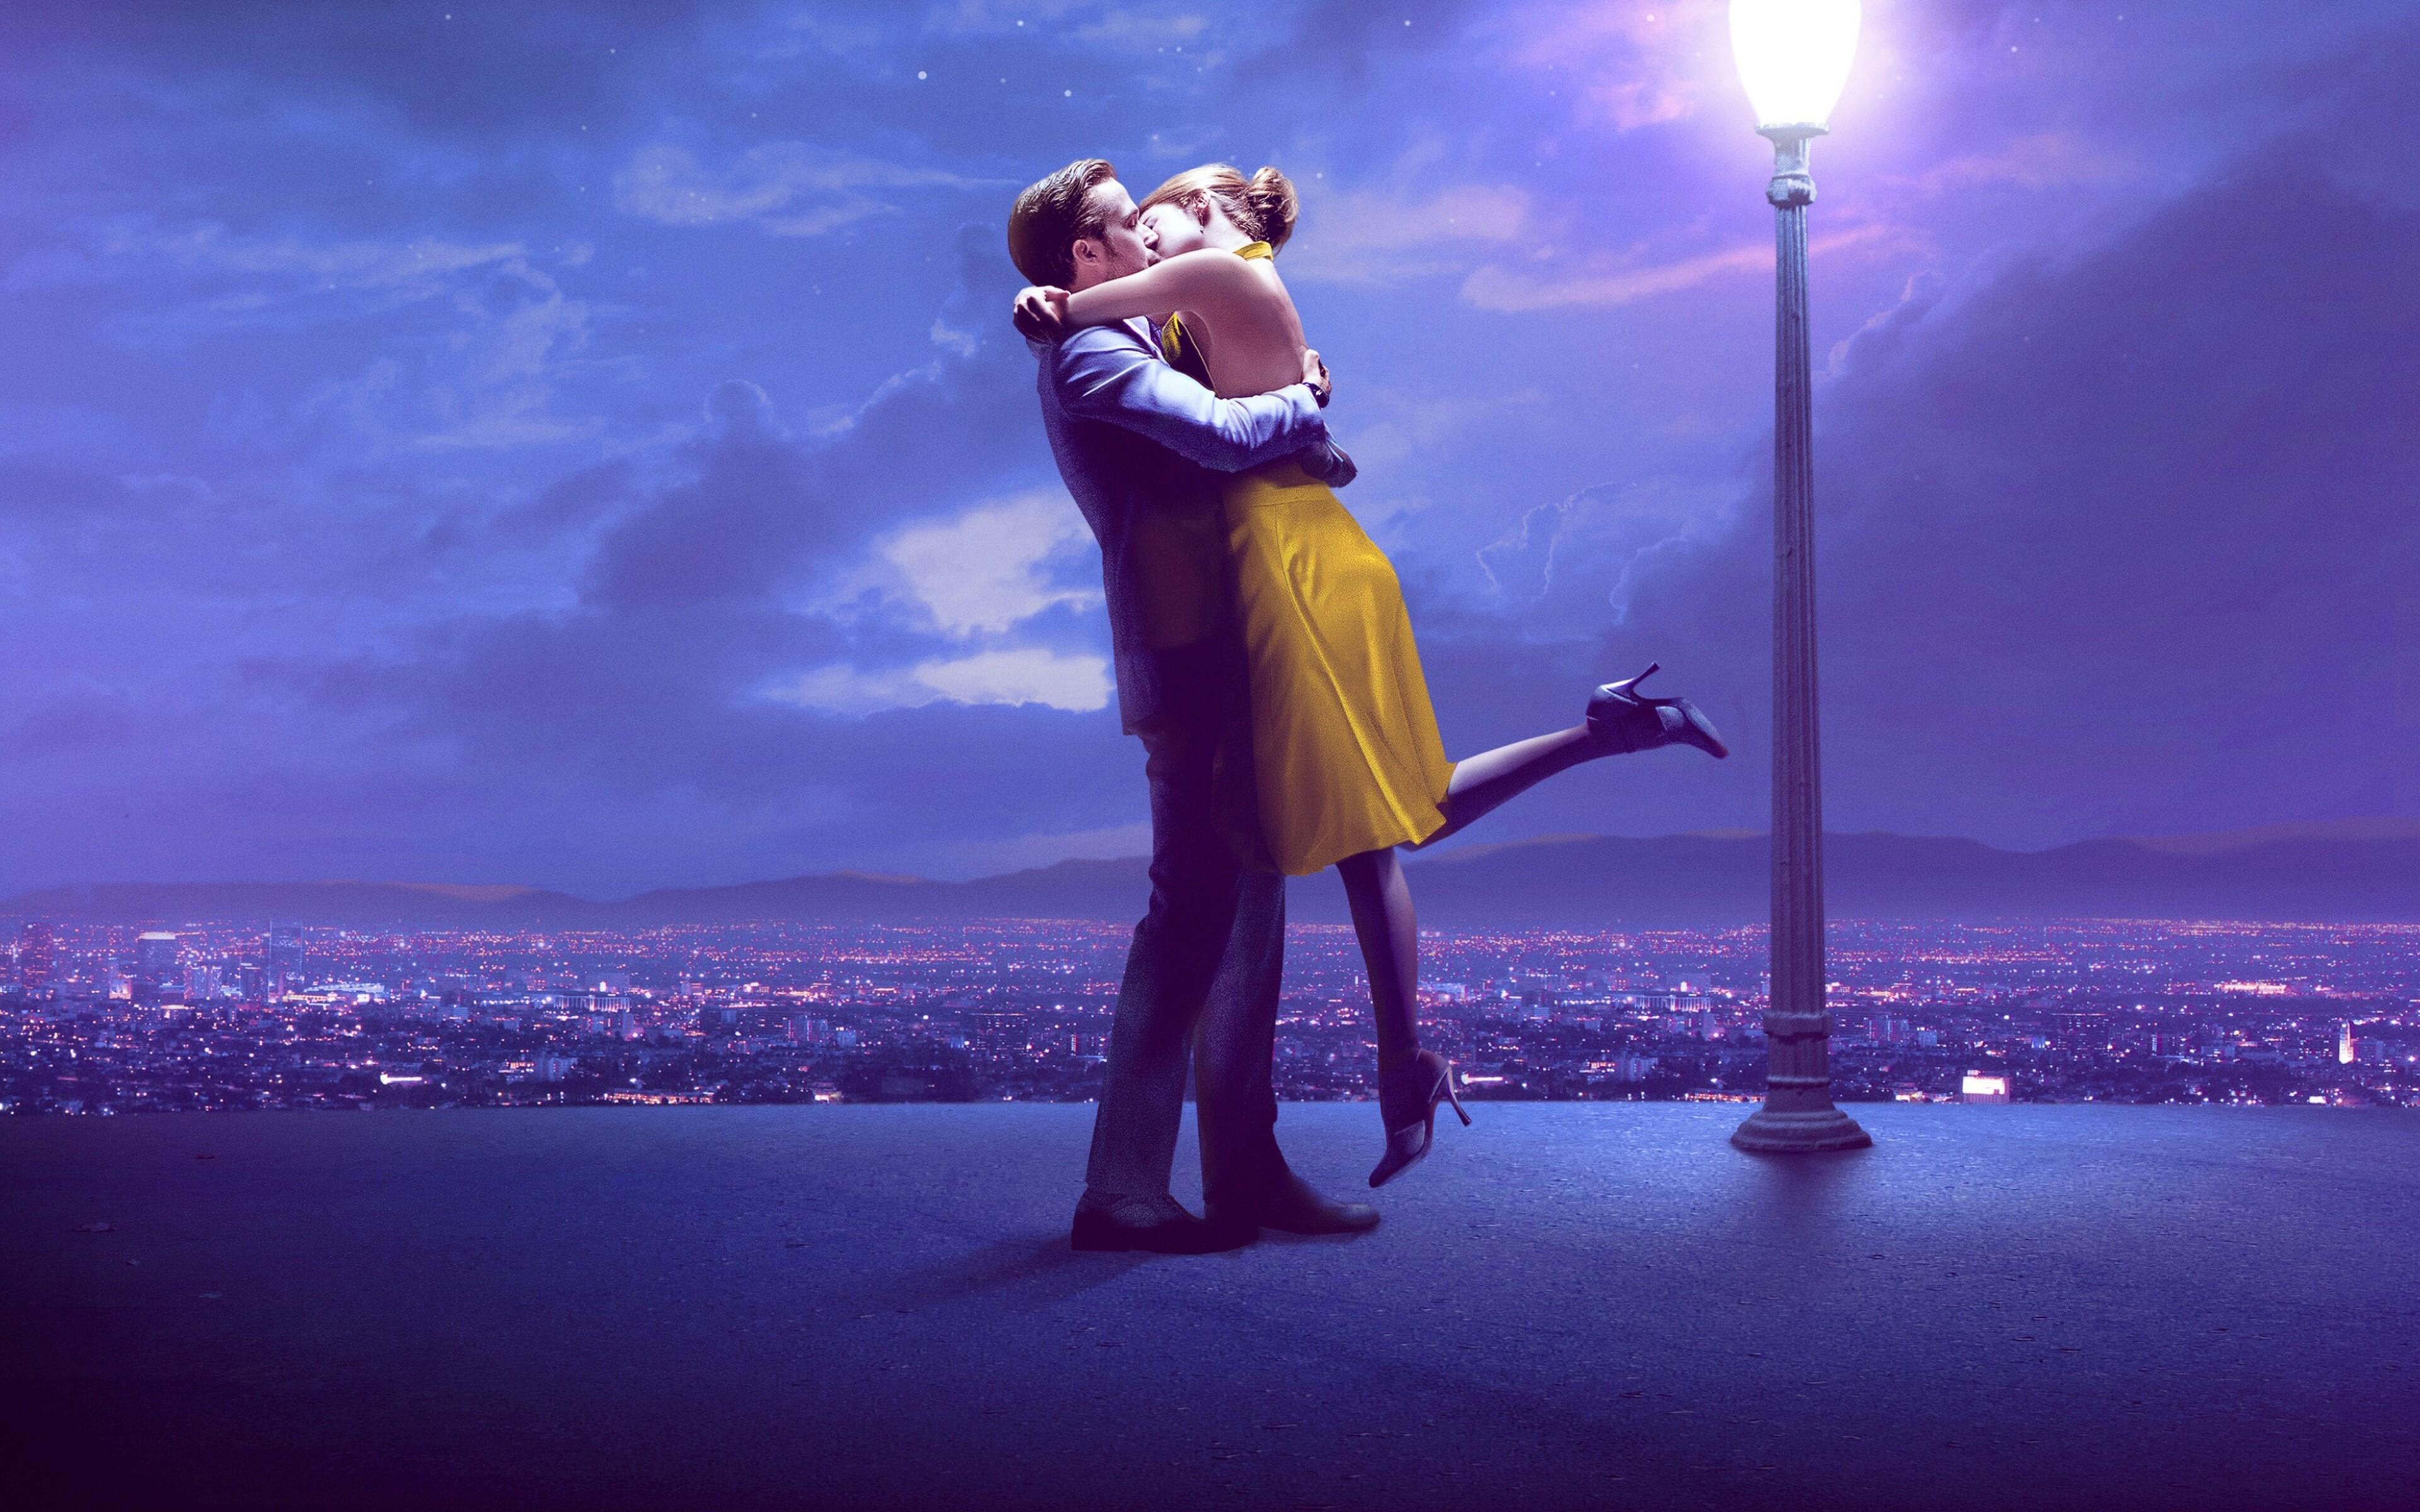 couple-kissing-4k-ryan-gosling-emma-stone-qhd.jpg